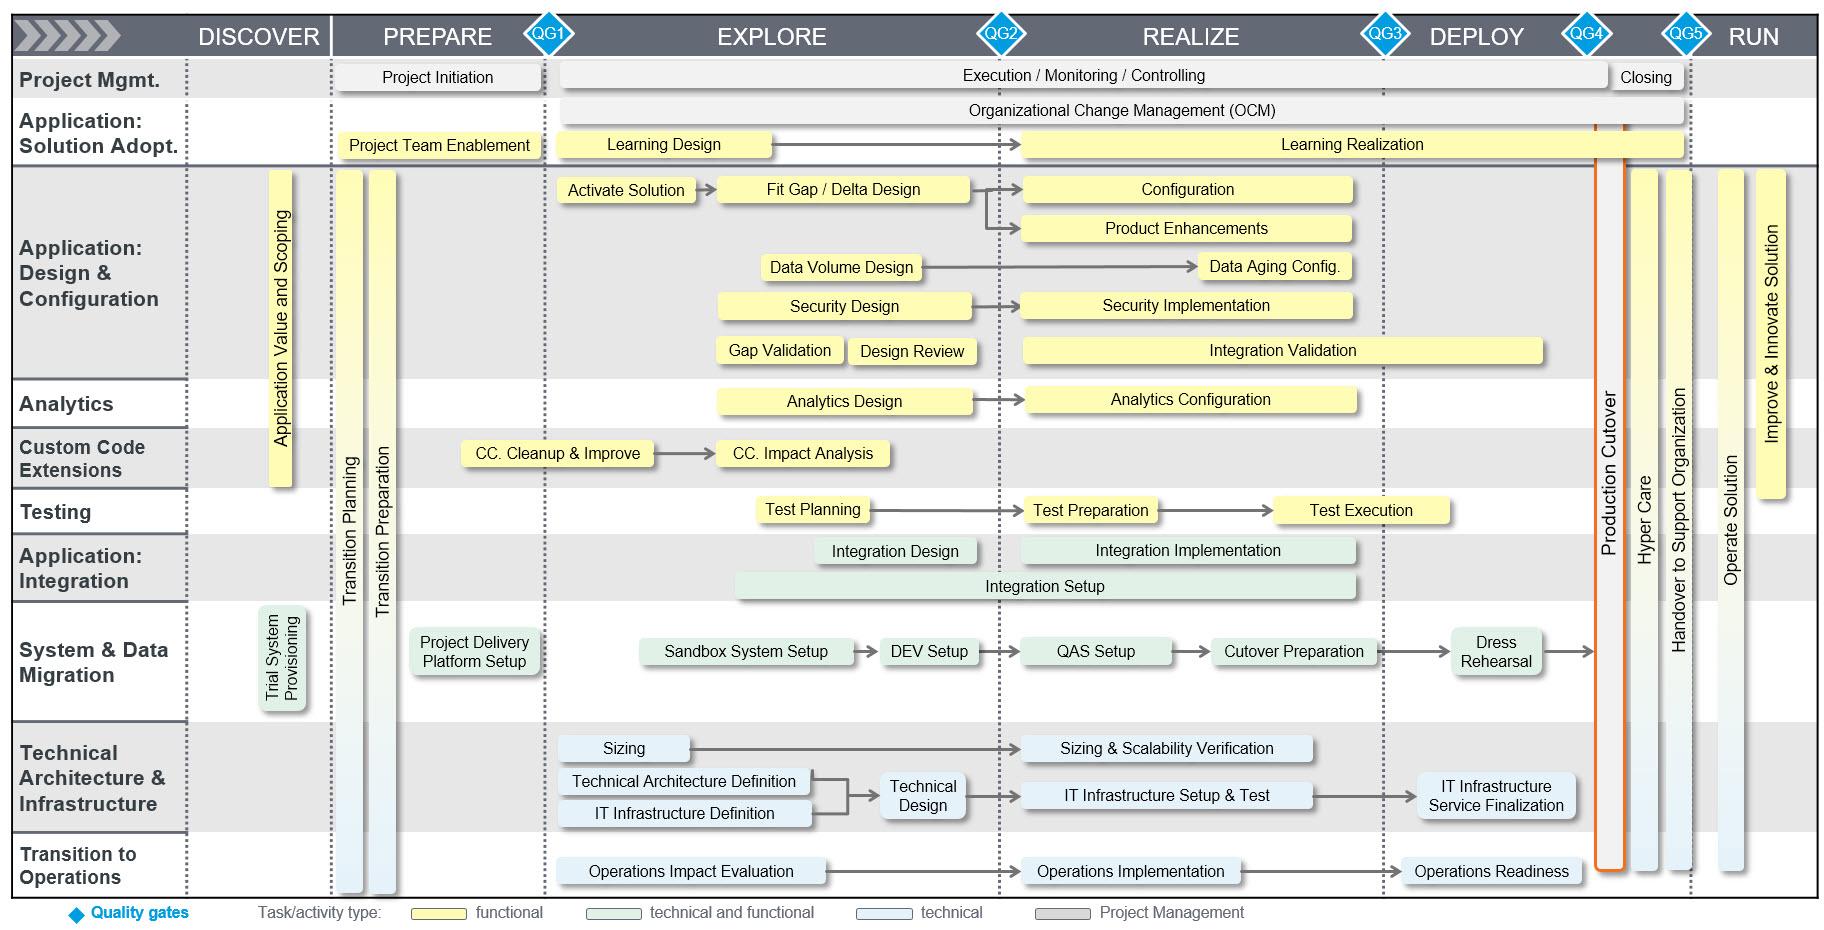 "New ""Maintenance Road Map for SAP S/4HANA"" | SAP Blogs on sap enterprise map, sap security map, risk heat map, it services map, sap process map, sap strategy map, sap netweaver map, infor solution map, sap marketing map, problem and solution map, sap value map, sap product map, sap road map, deloitte solution map, sap customer map, sap data map,"